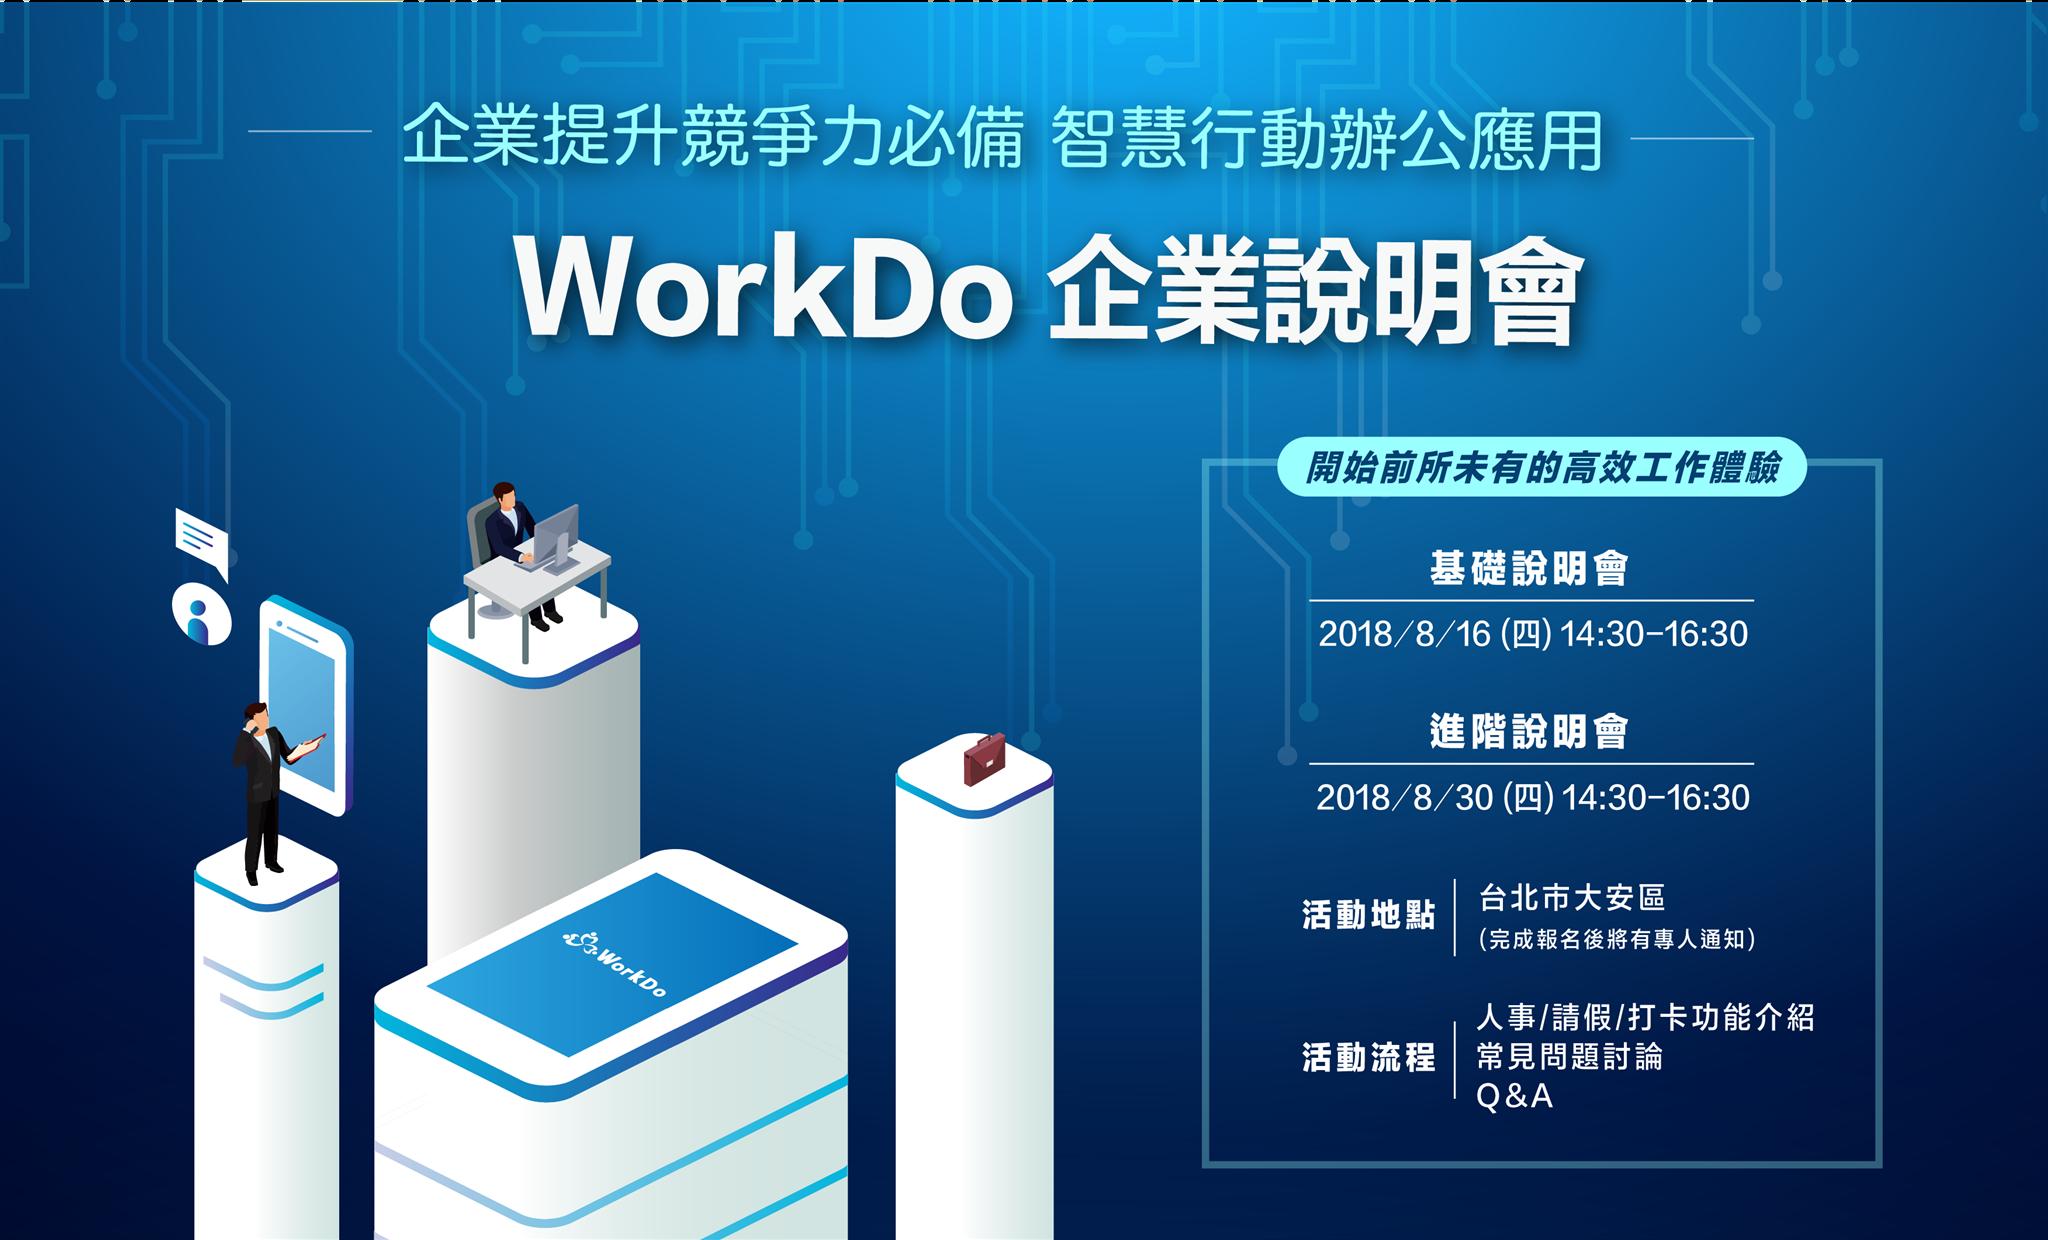 WorkDo智慧行動辦公應用